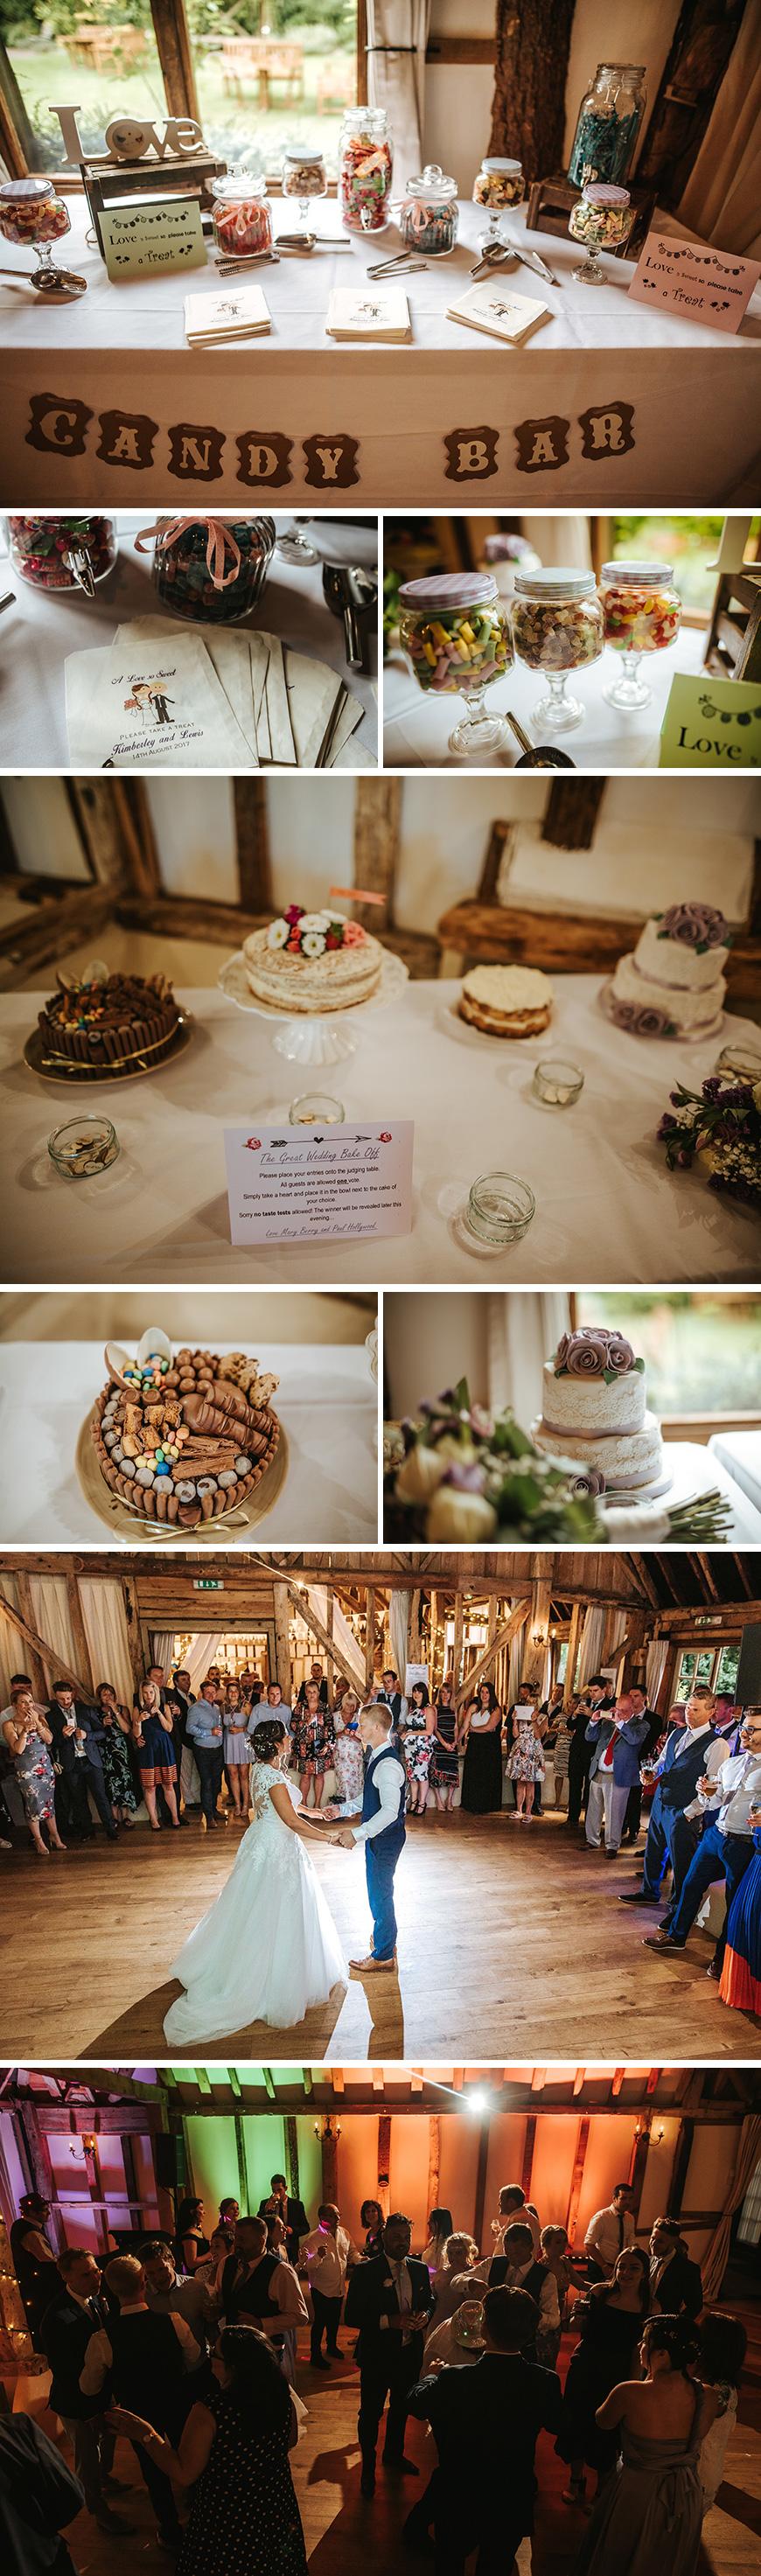 Real Wedding - Kim and Lewis's Pretty Pastel Summer Wedding at Clock Barn | CHWV